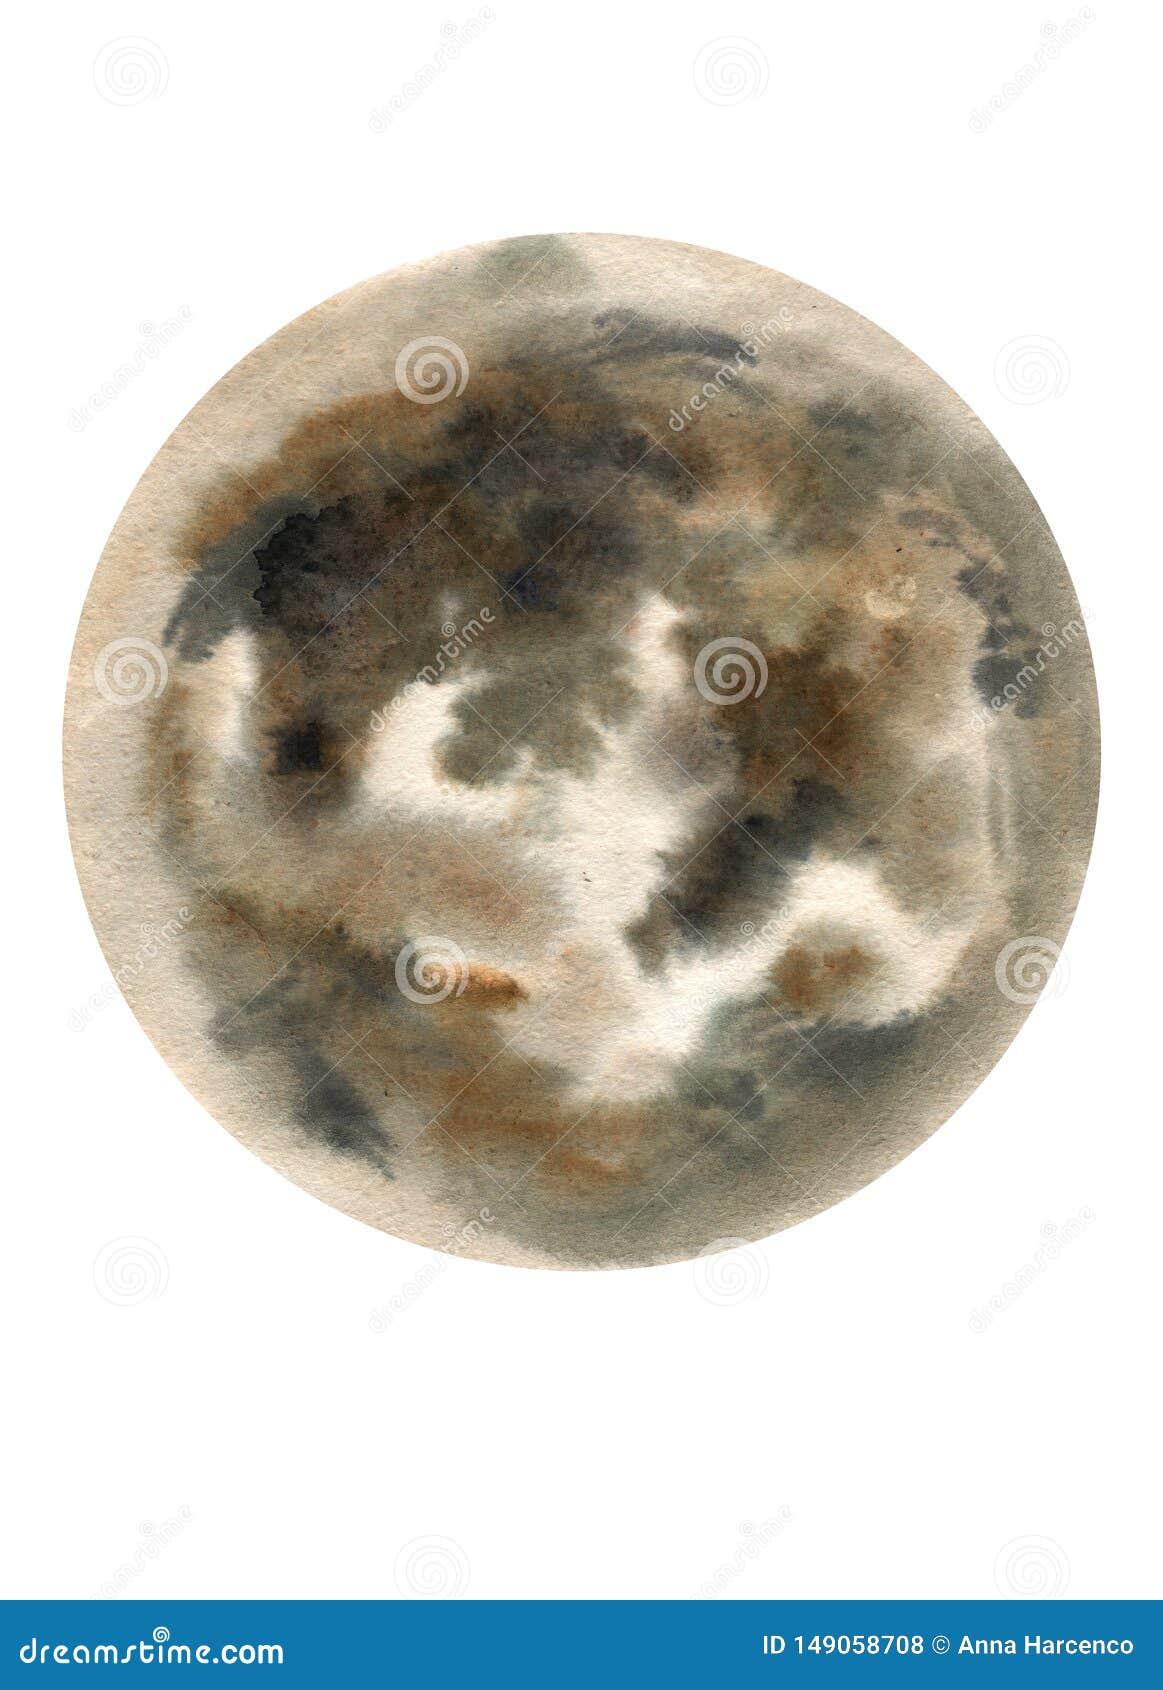 Big watercolor moon illustration. Symbol of new beginning, dreaming, romance, fantasy, magic. Black, grey colors, circle, full vie